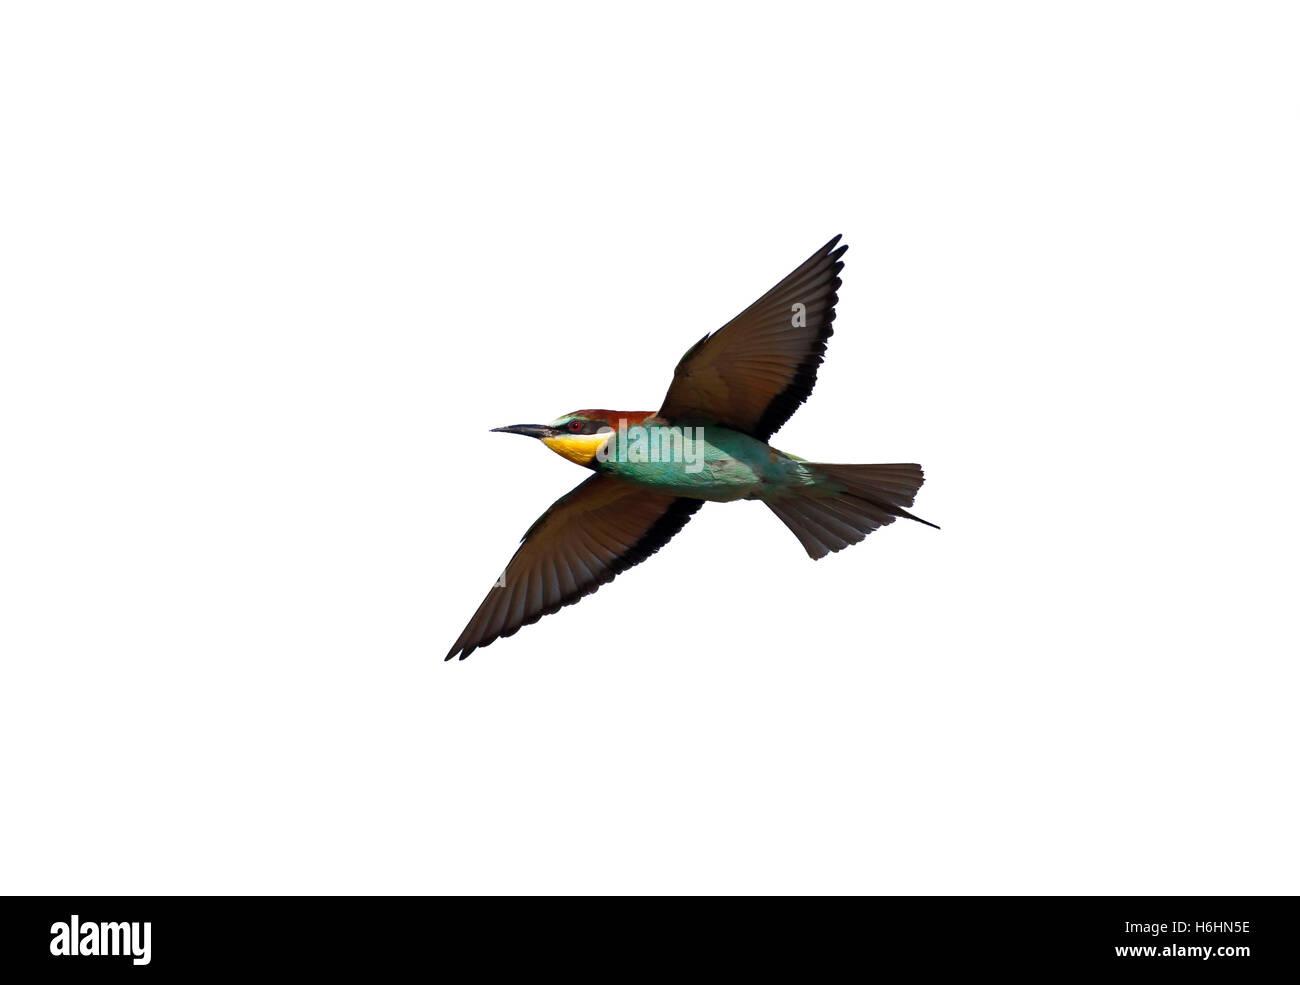 European bee-eater, Merops apiaster, single bird in flight, Bulgaria, May 2013 Stock Photo